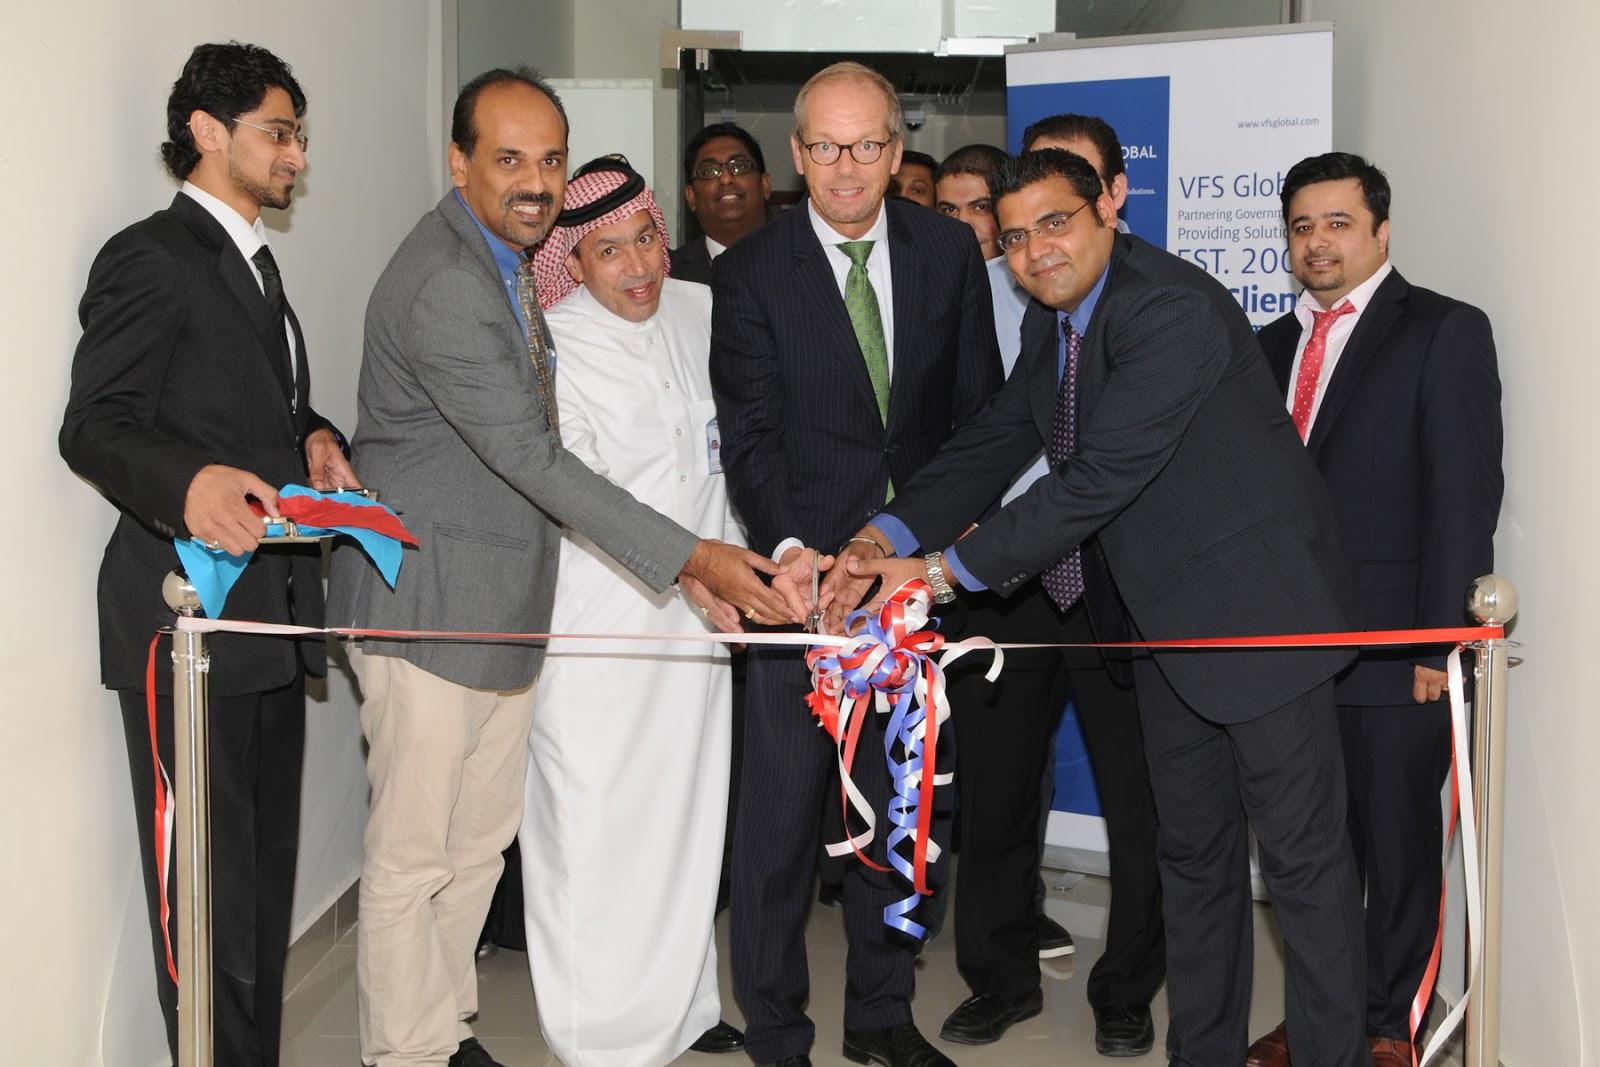 Company News in Egypt: Netherlands joins VFS Global Schengen